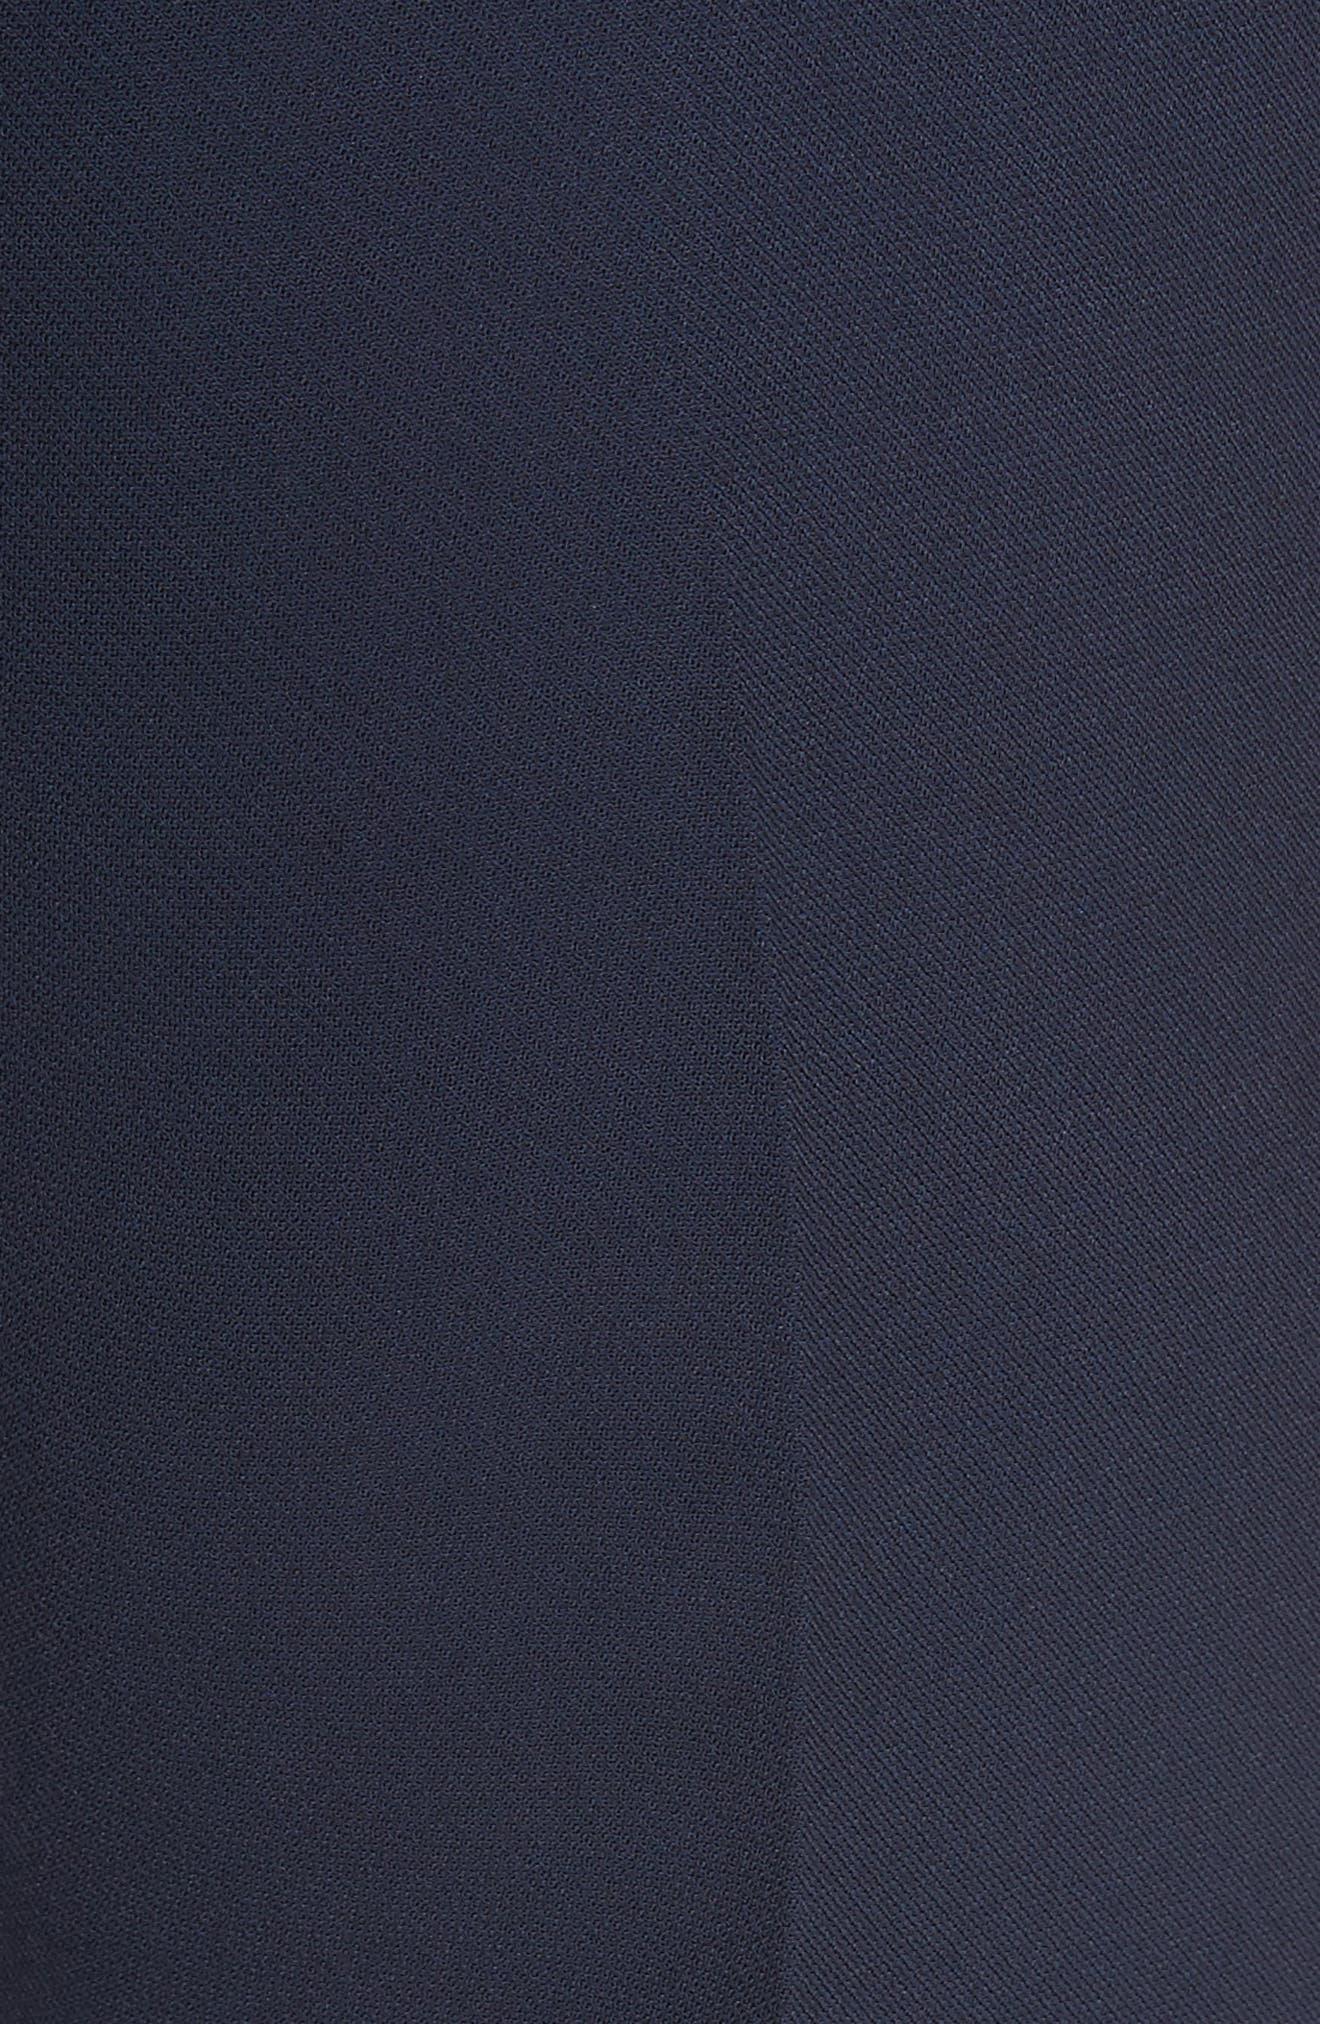 Ruscha Jumpsuit,                             Alternate thumbnail 6, color,                             Navy